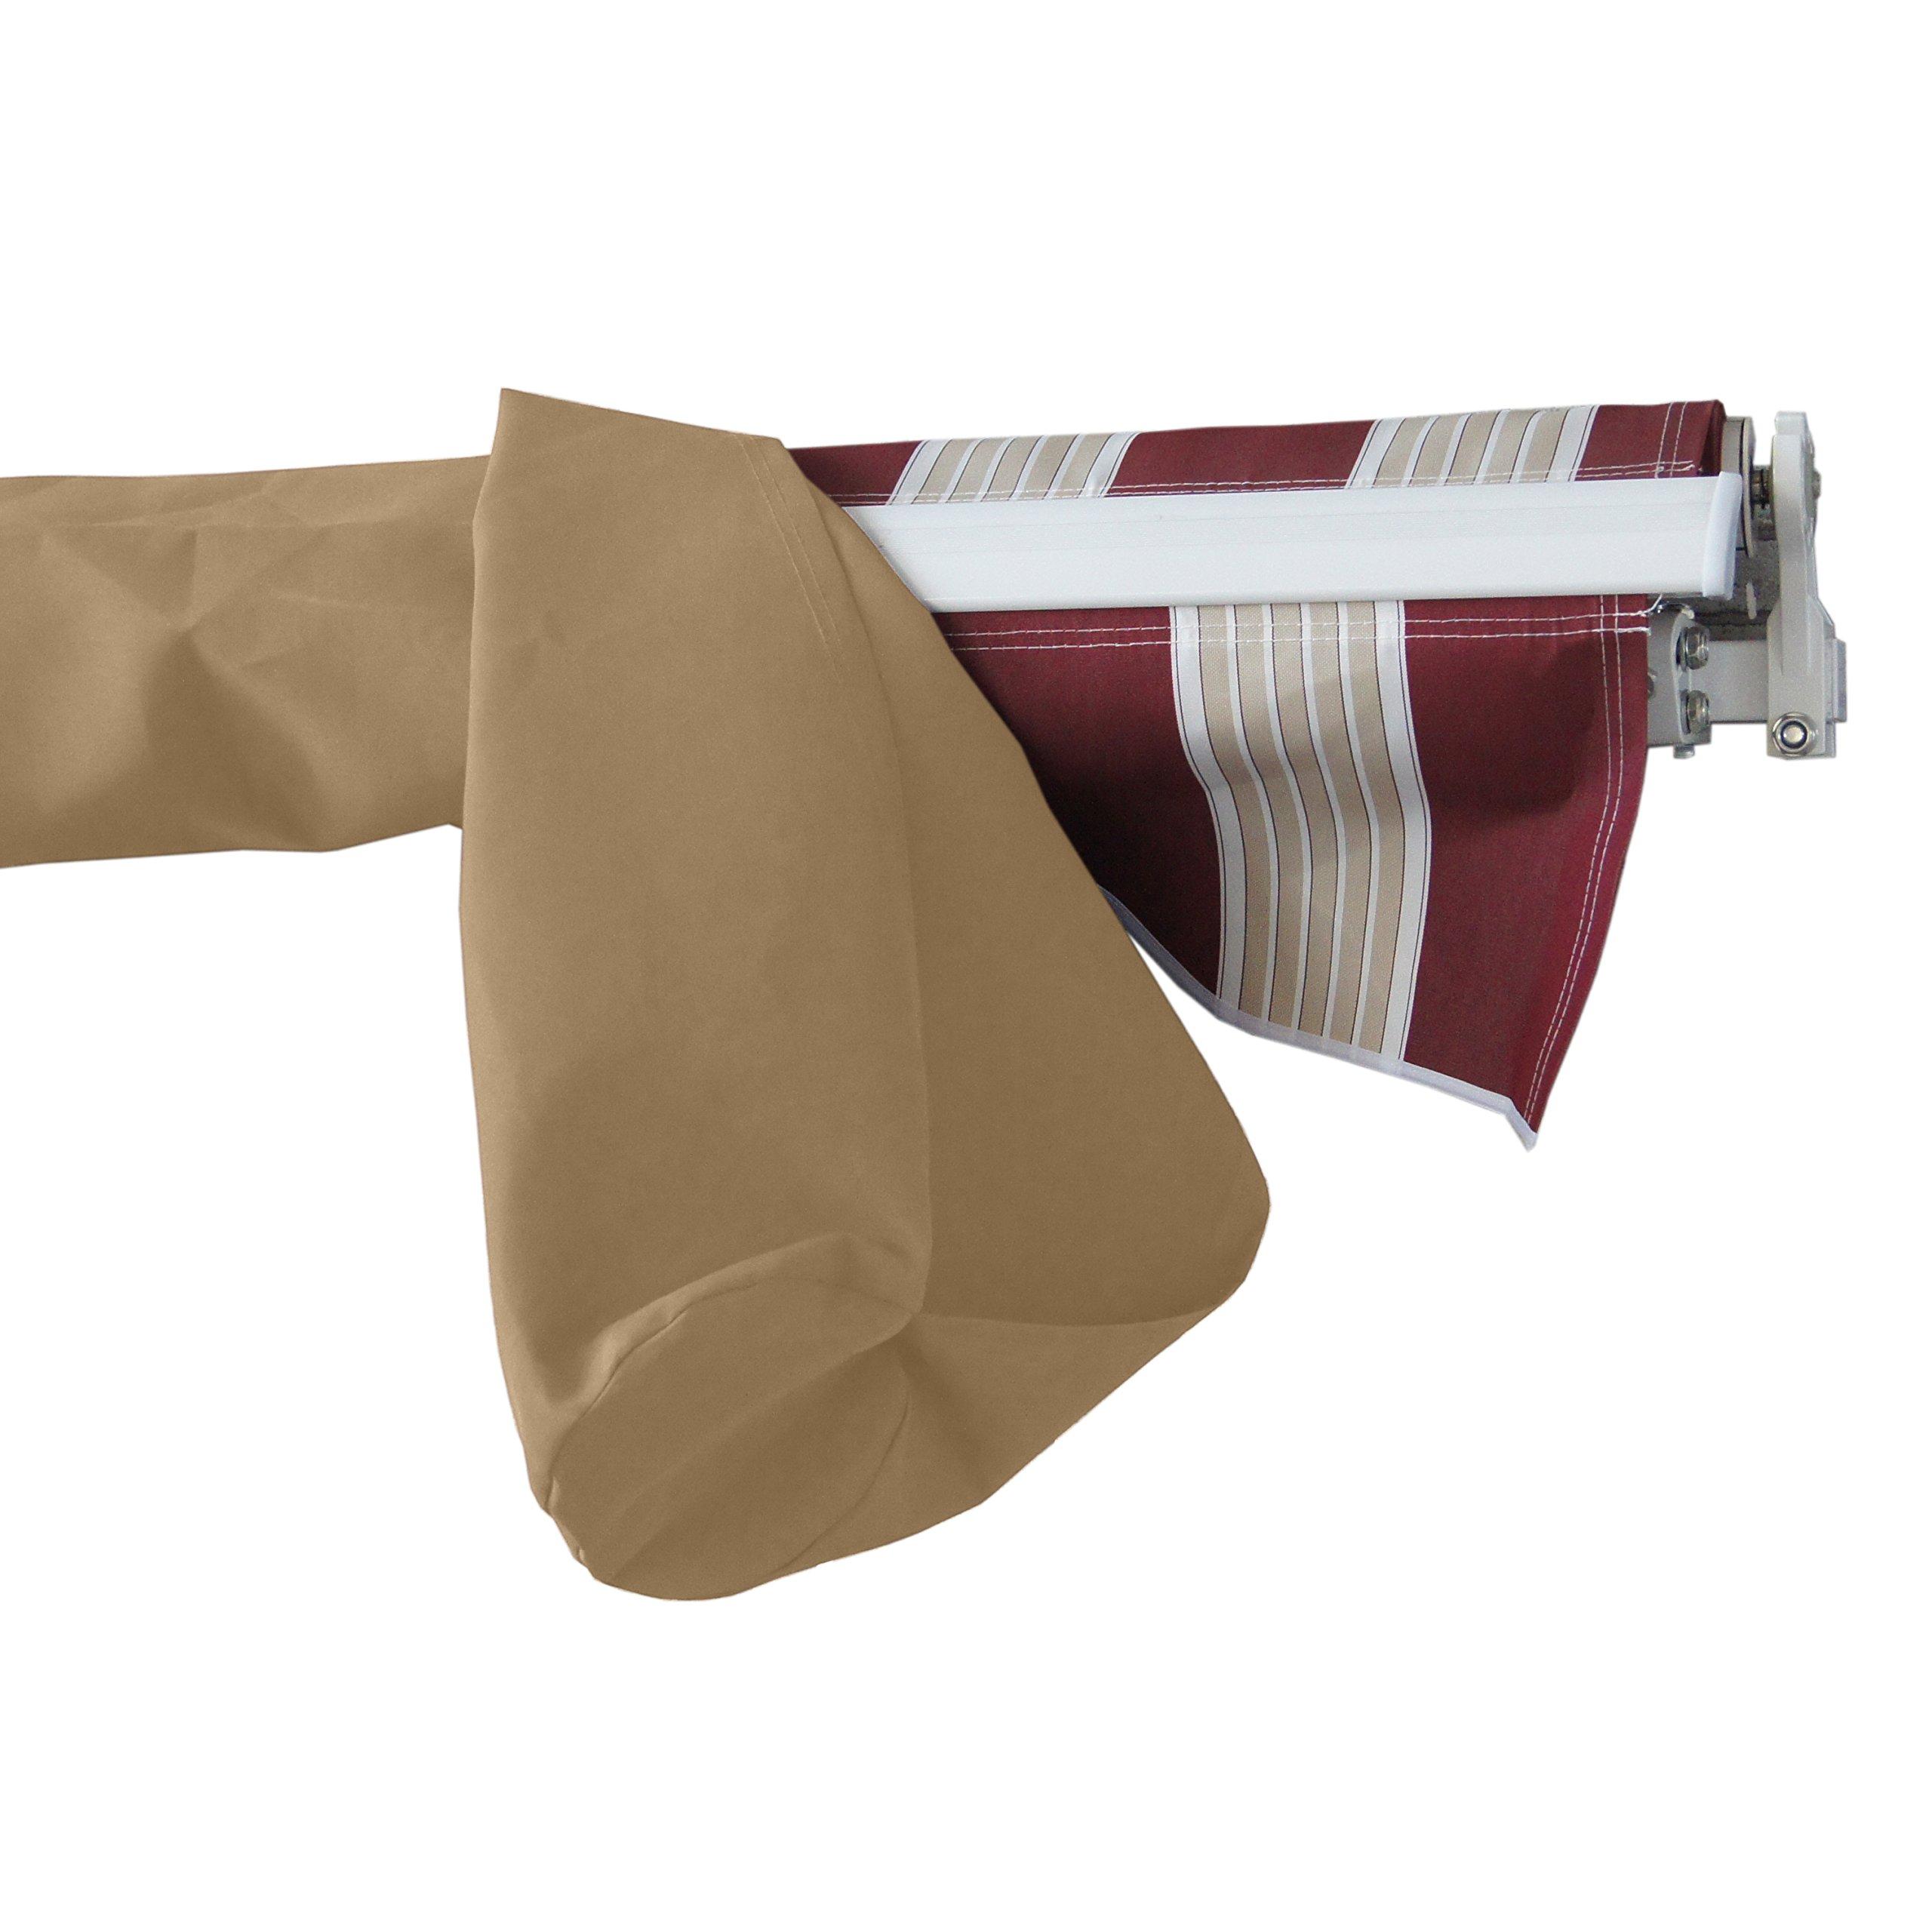 ALEKO AWPSC12X10SD31 Protective Awning Cover Rain Canopy Storage Bag 12 x 10 Feet Sand